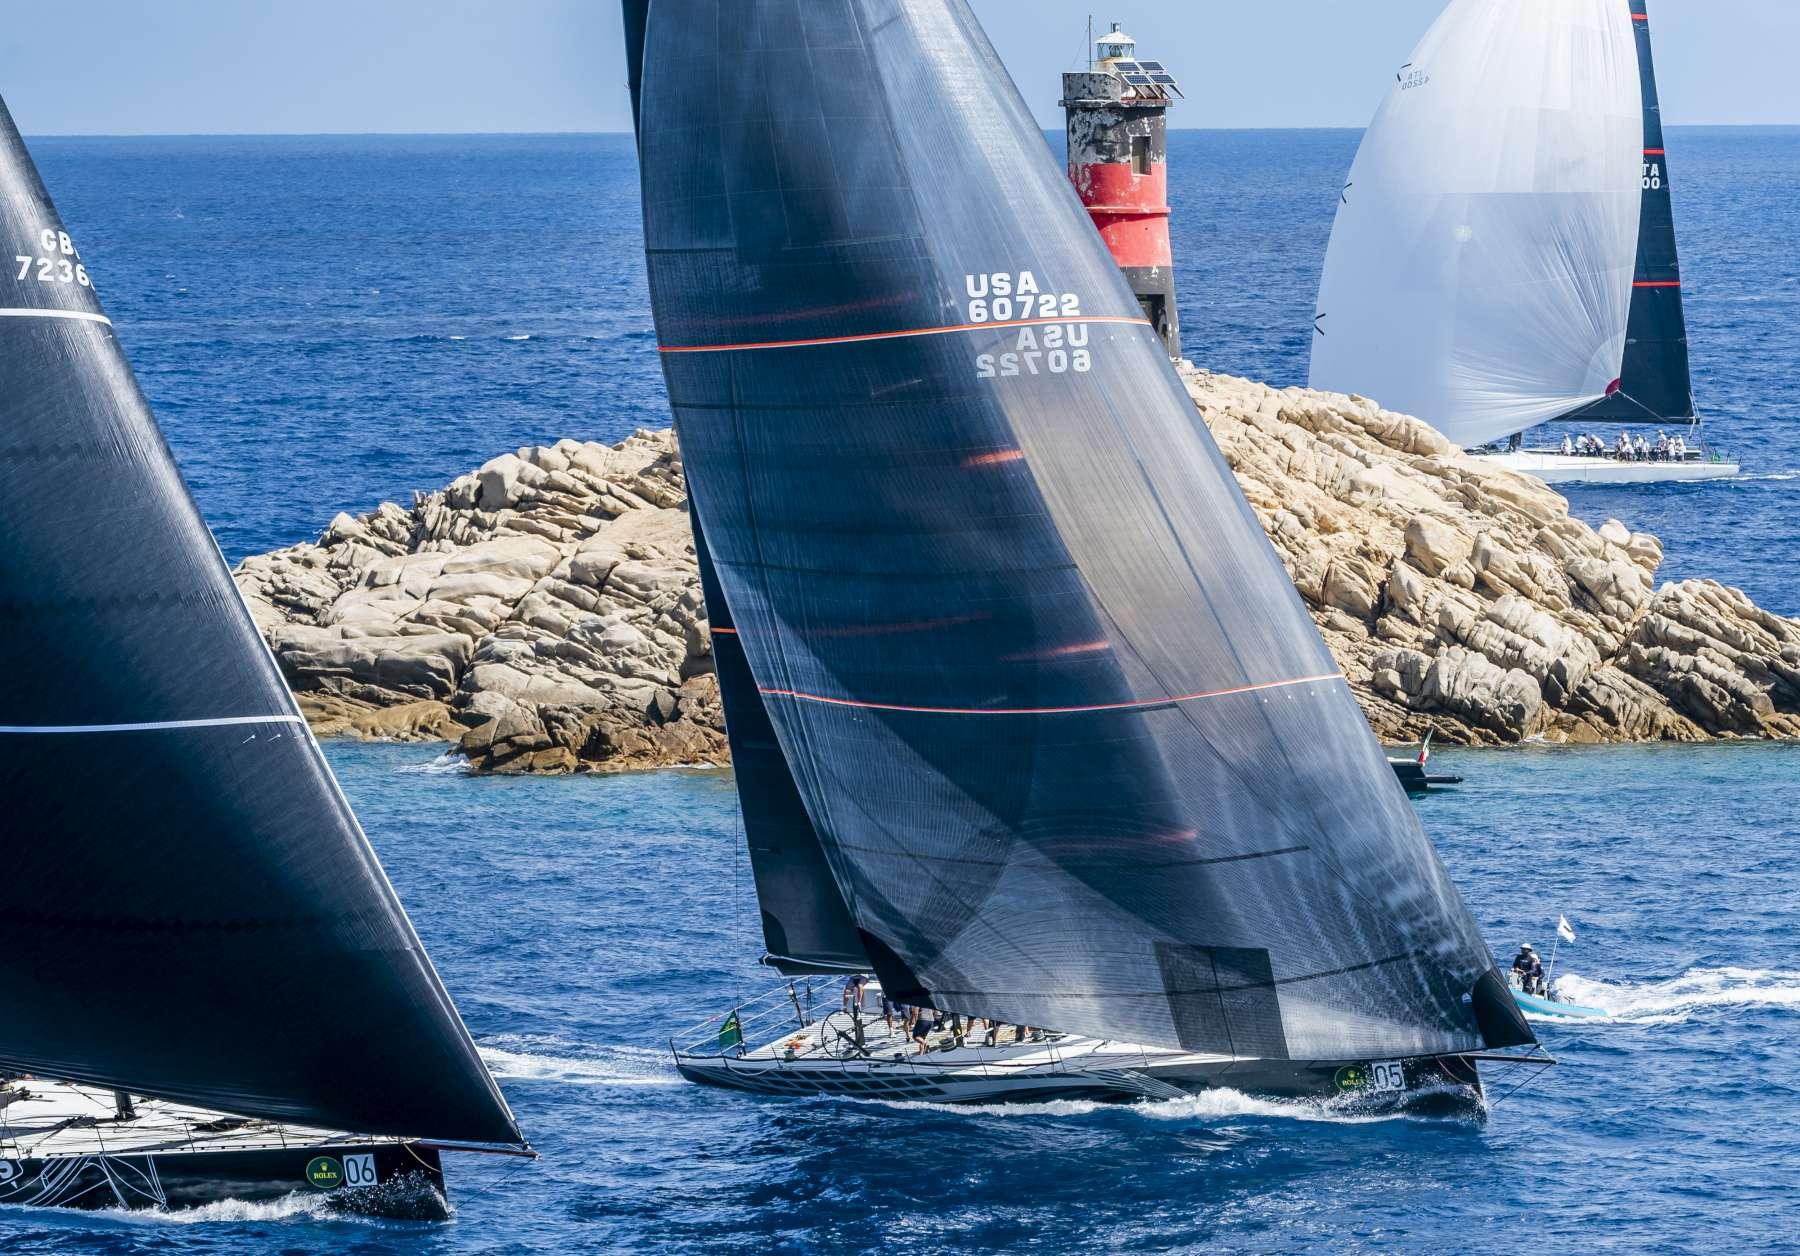 Maxi Yacht Rolex Cup 2019 NOR online  - NEWS - Yacht Club Costa Smeralda